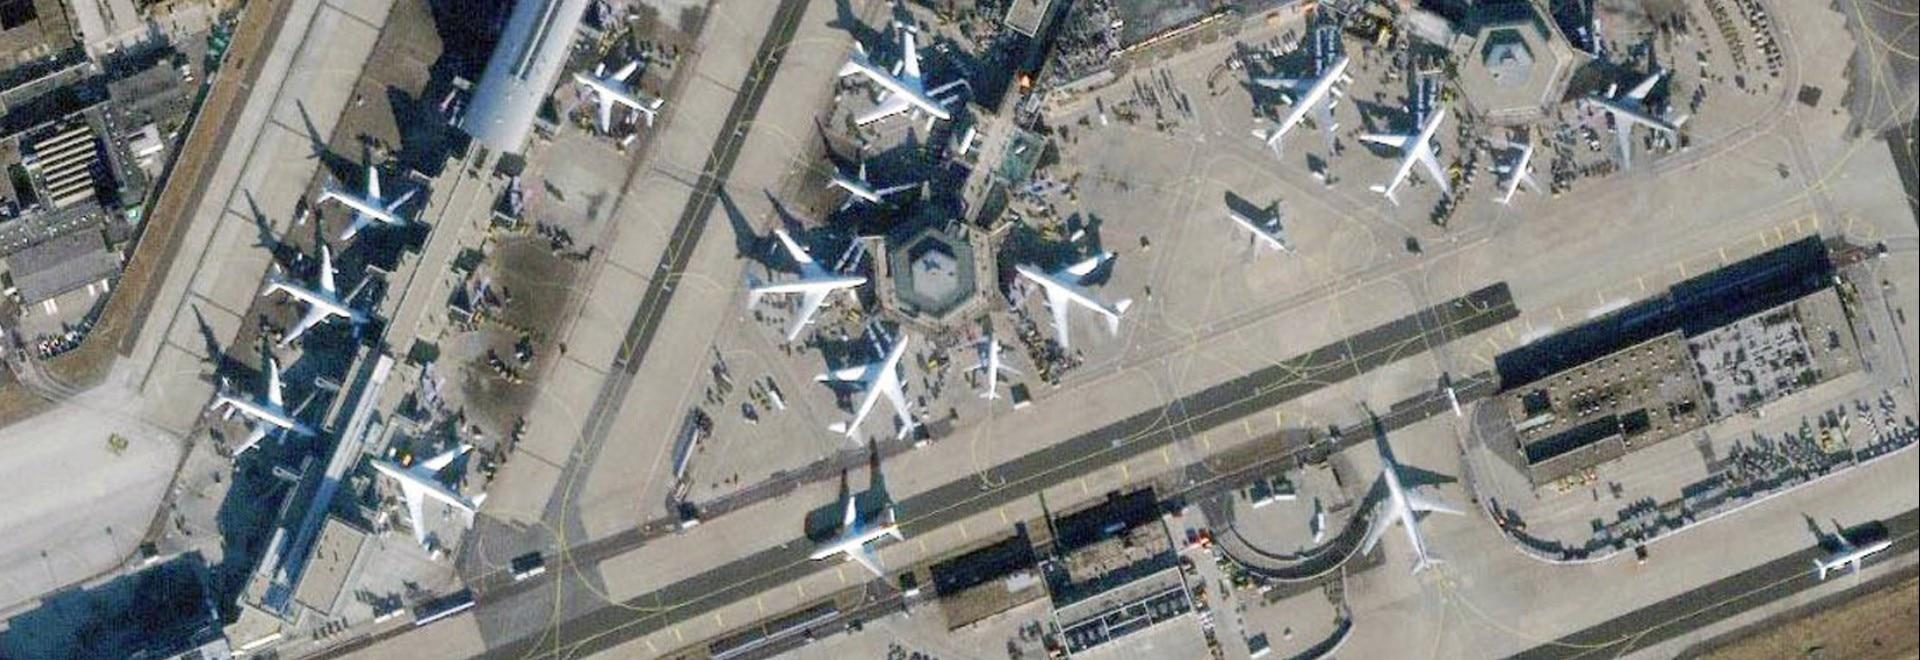 Mega aeroporto ai raggi X